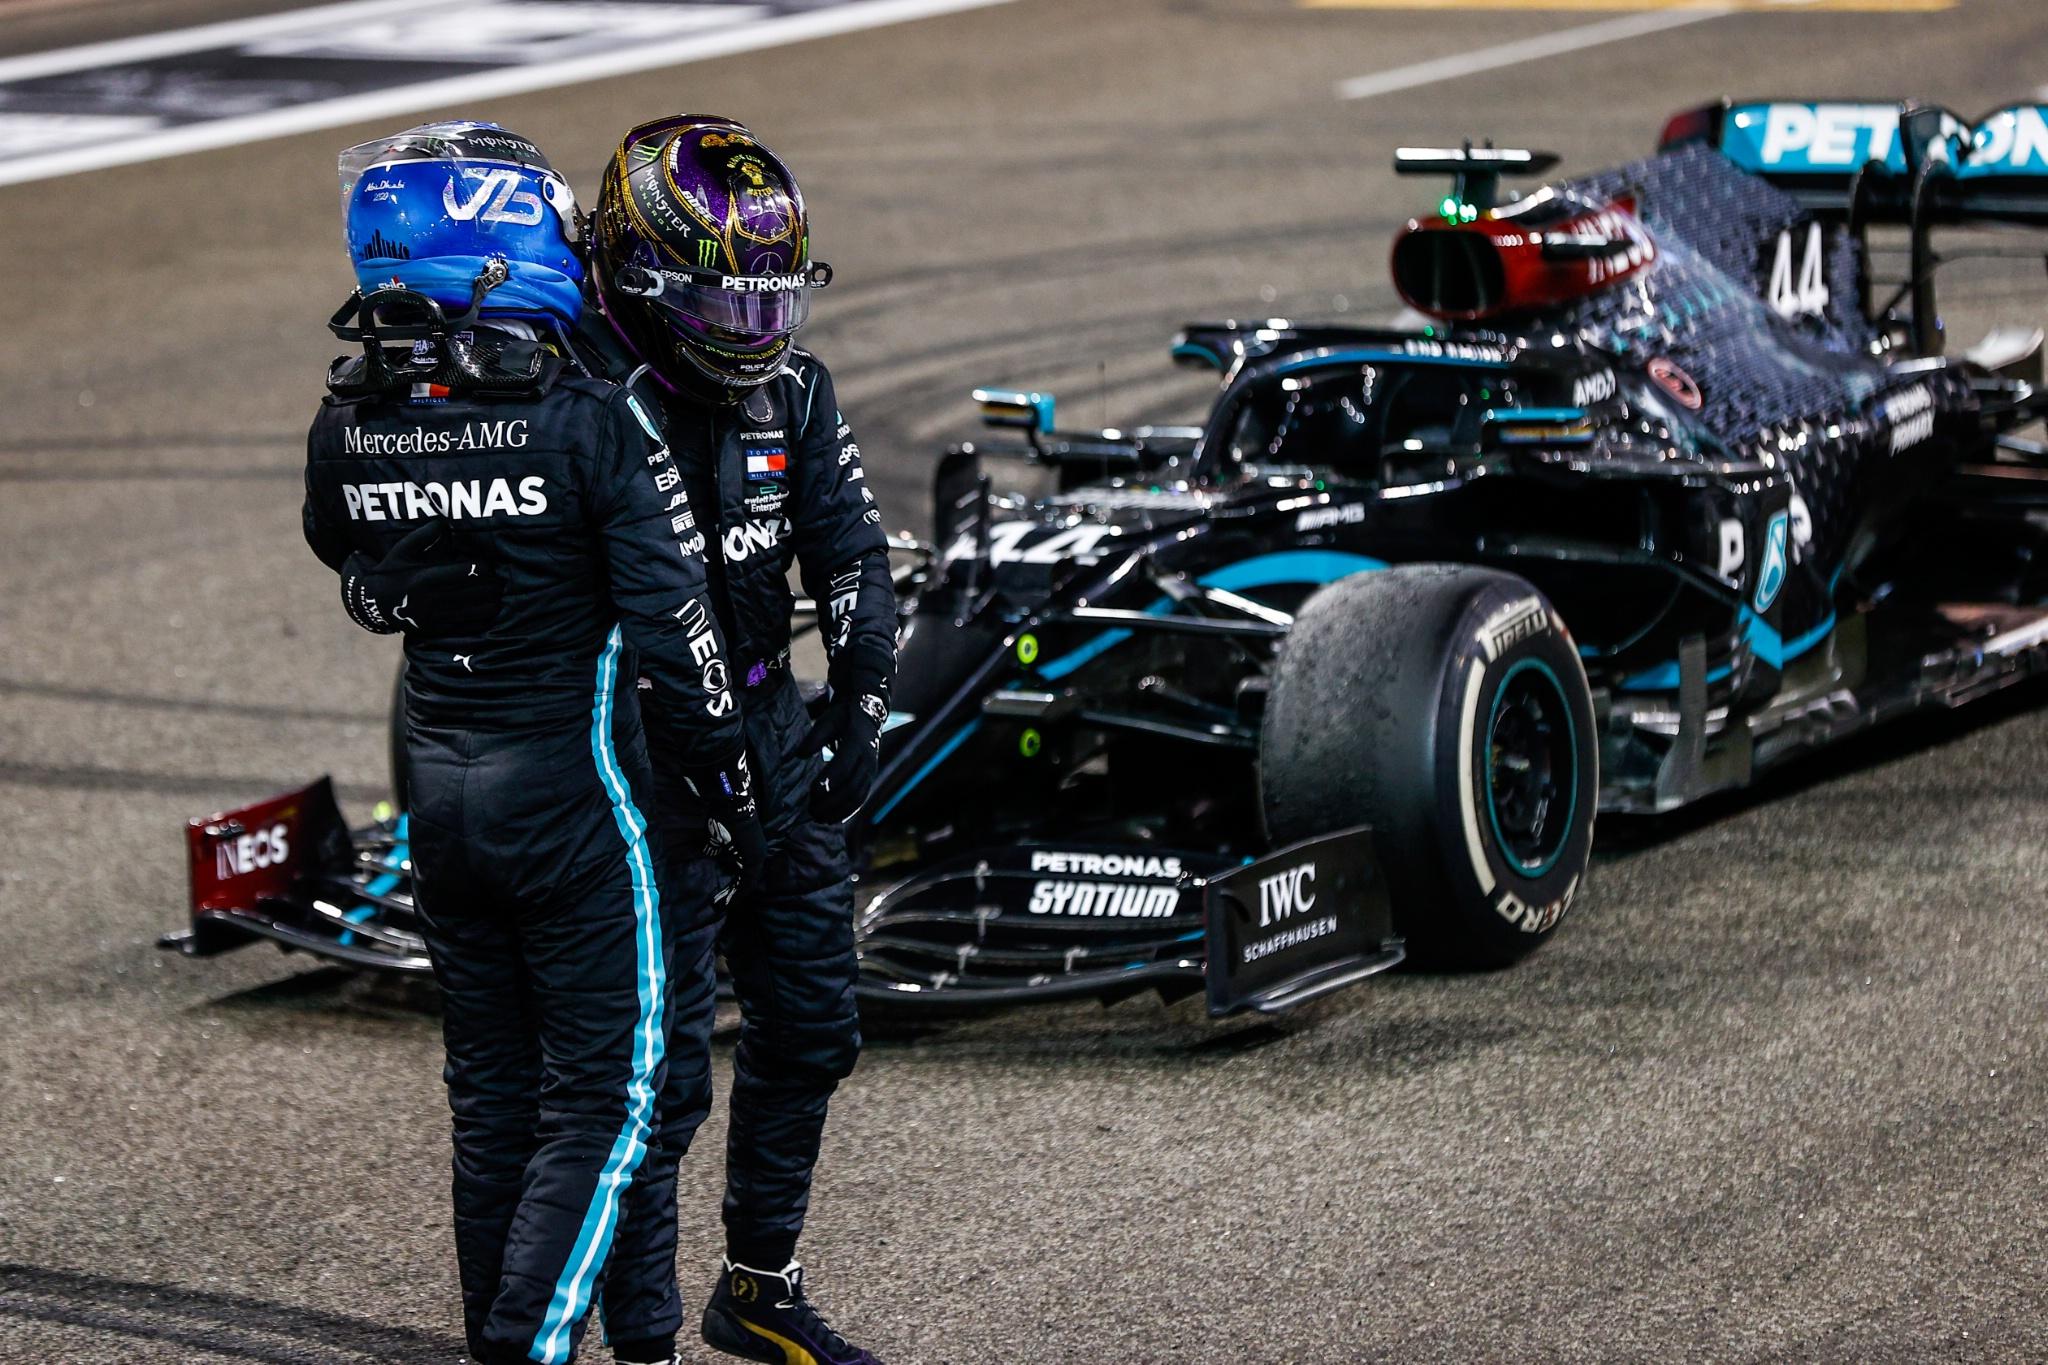 Valtteri Bottas (FIN) Mercedes AMG F1 and Lewis Hamilton (GBR) Mercedes AMG F1 in parc ferme.